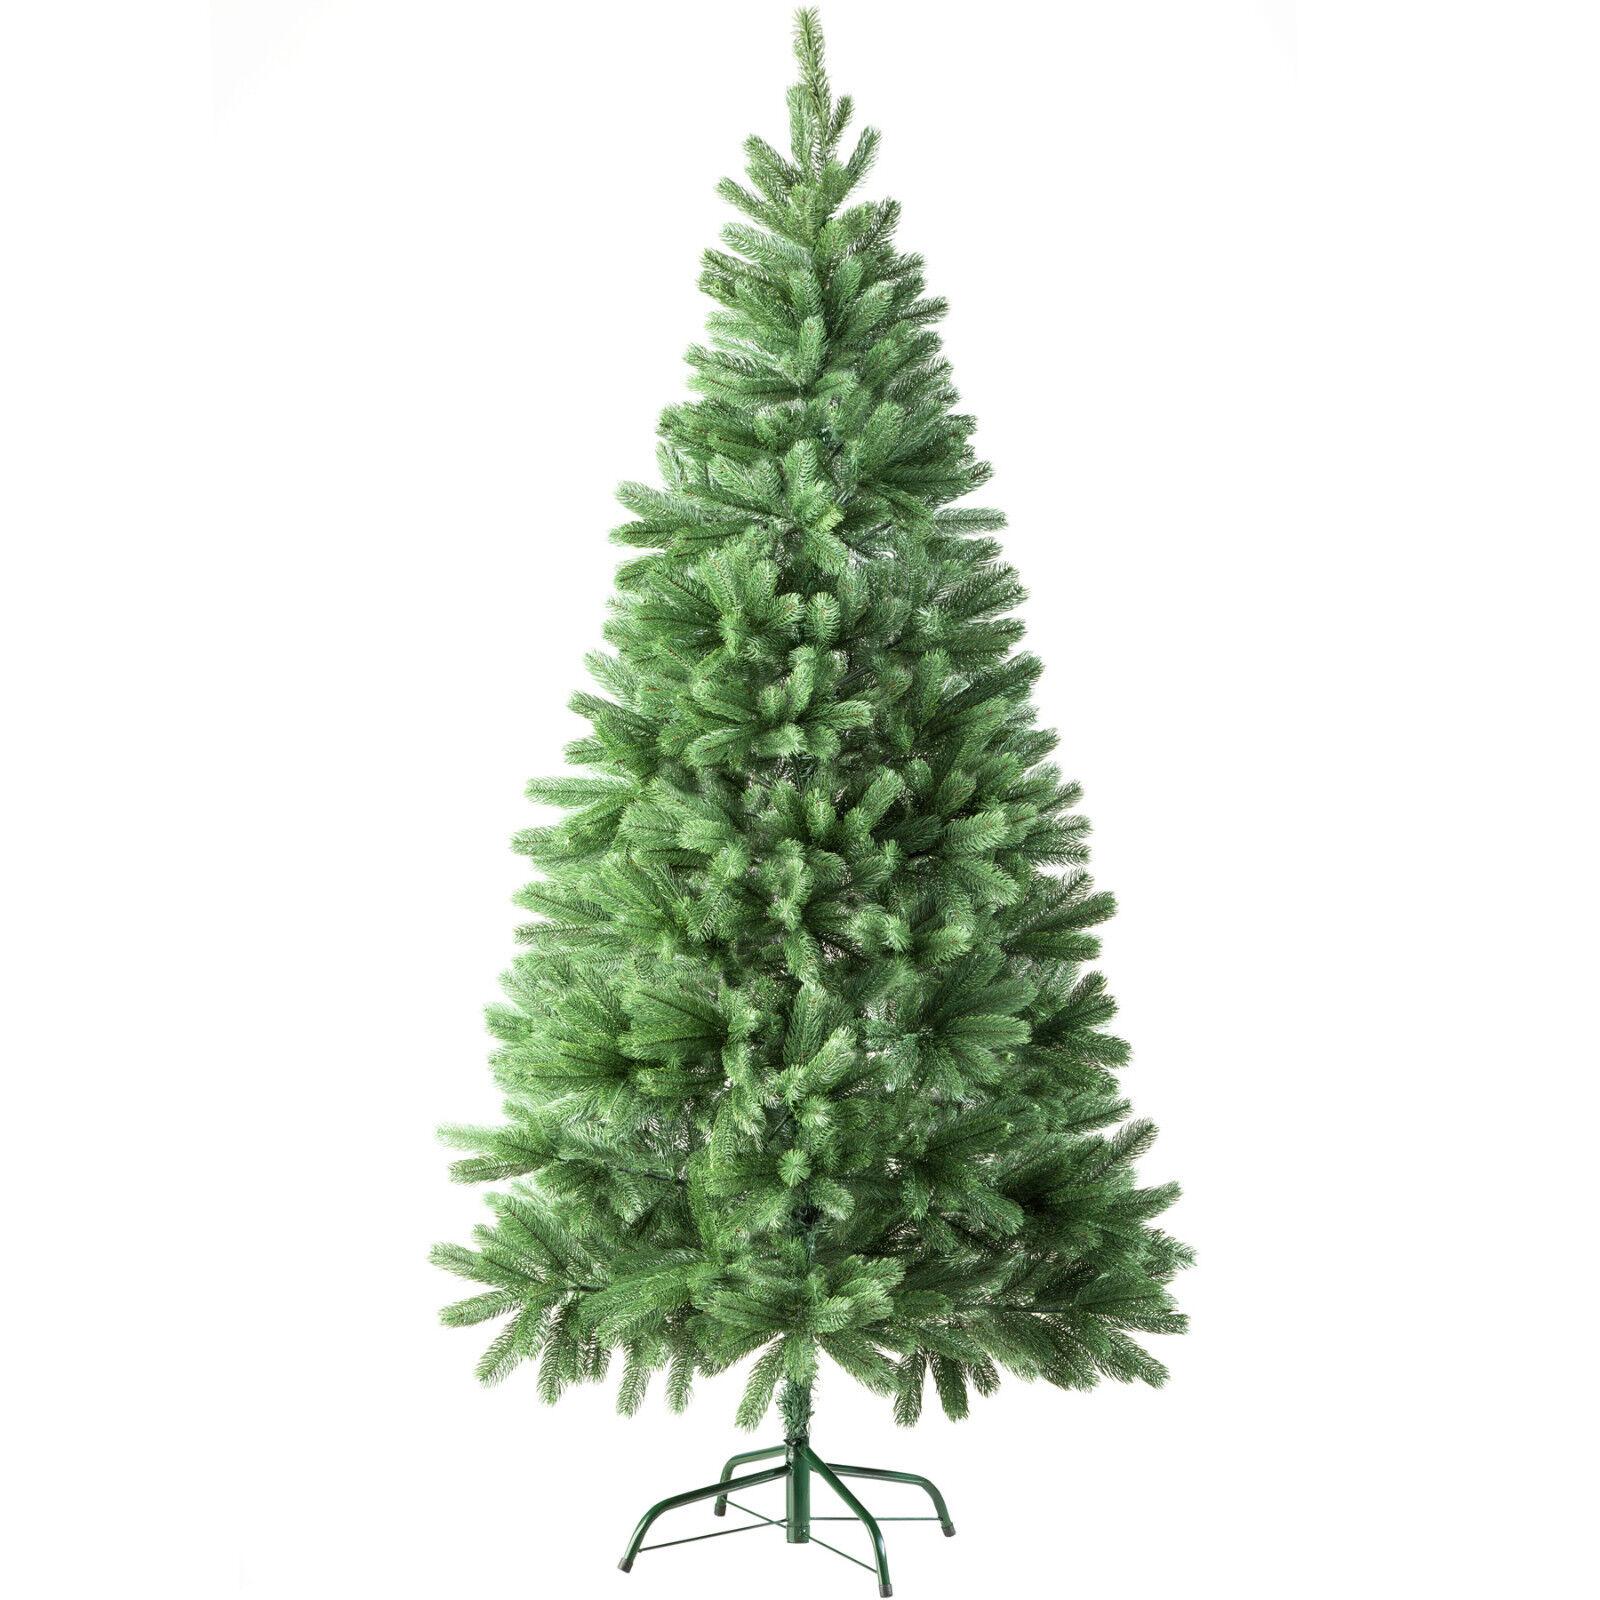 Sapin de Noël Arbre de Noel Artificiel 742 Branches + Pied En Métal 180cm Grün